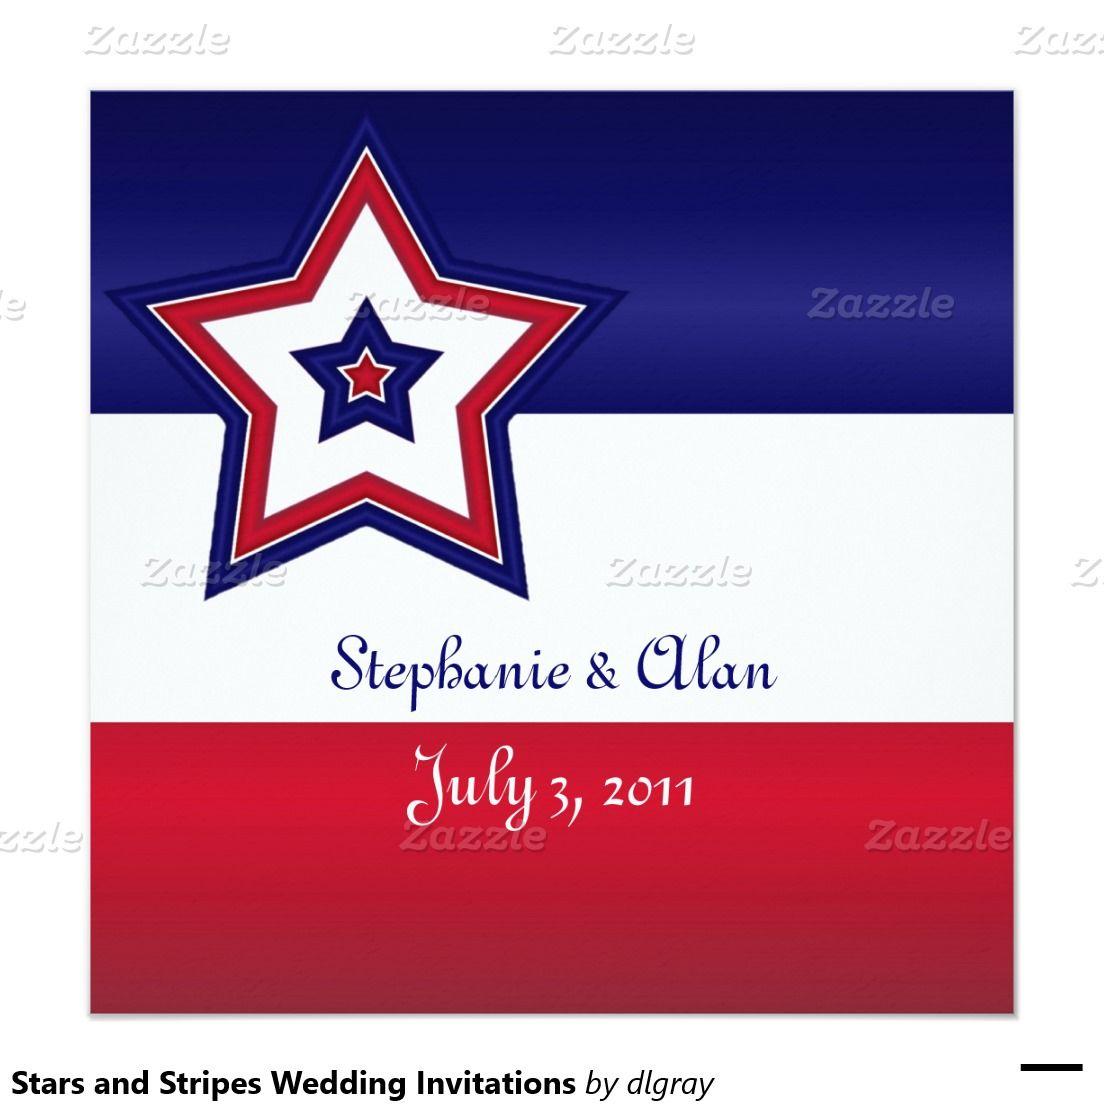 Stars and Stripes Wedding Invitations | Wedding Invitation Ideas ...